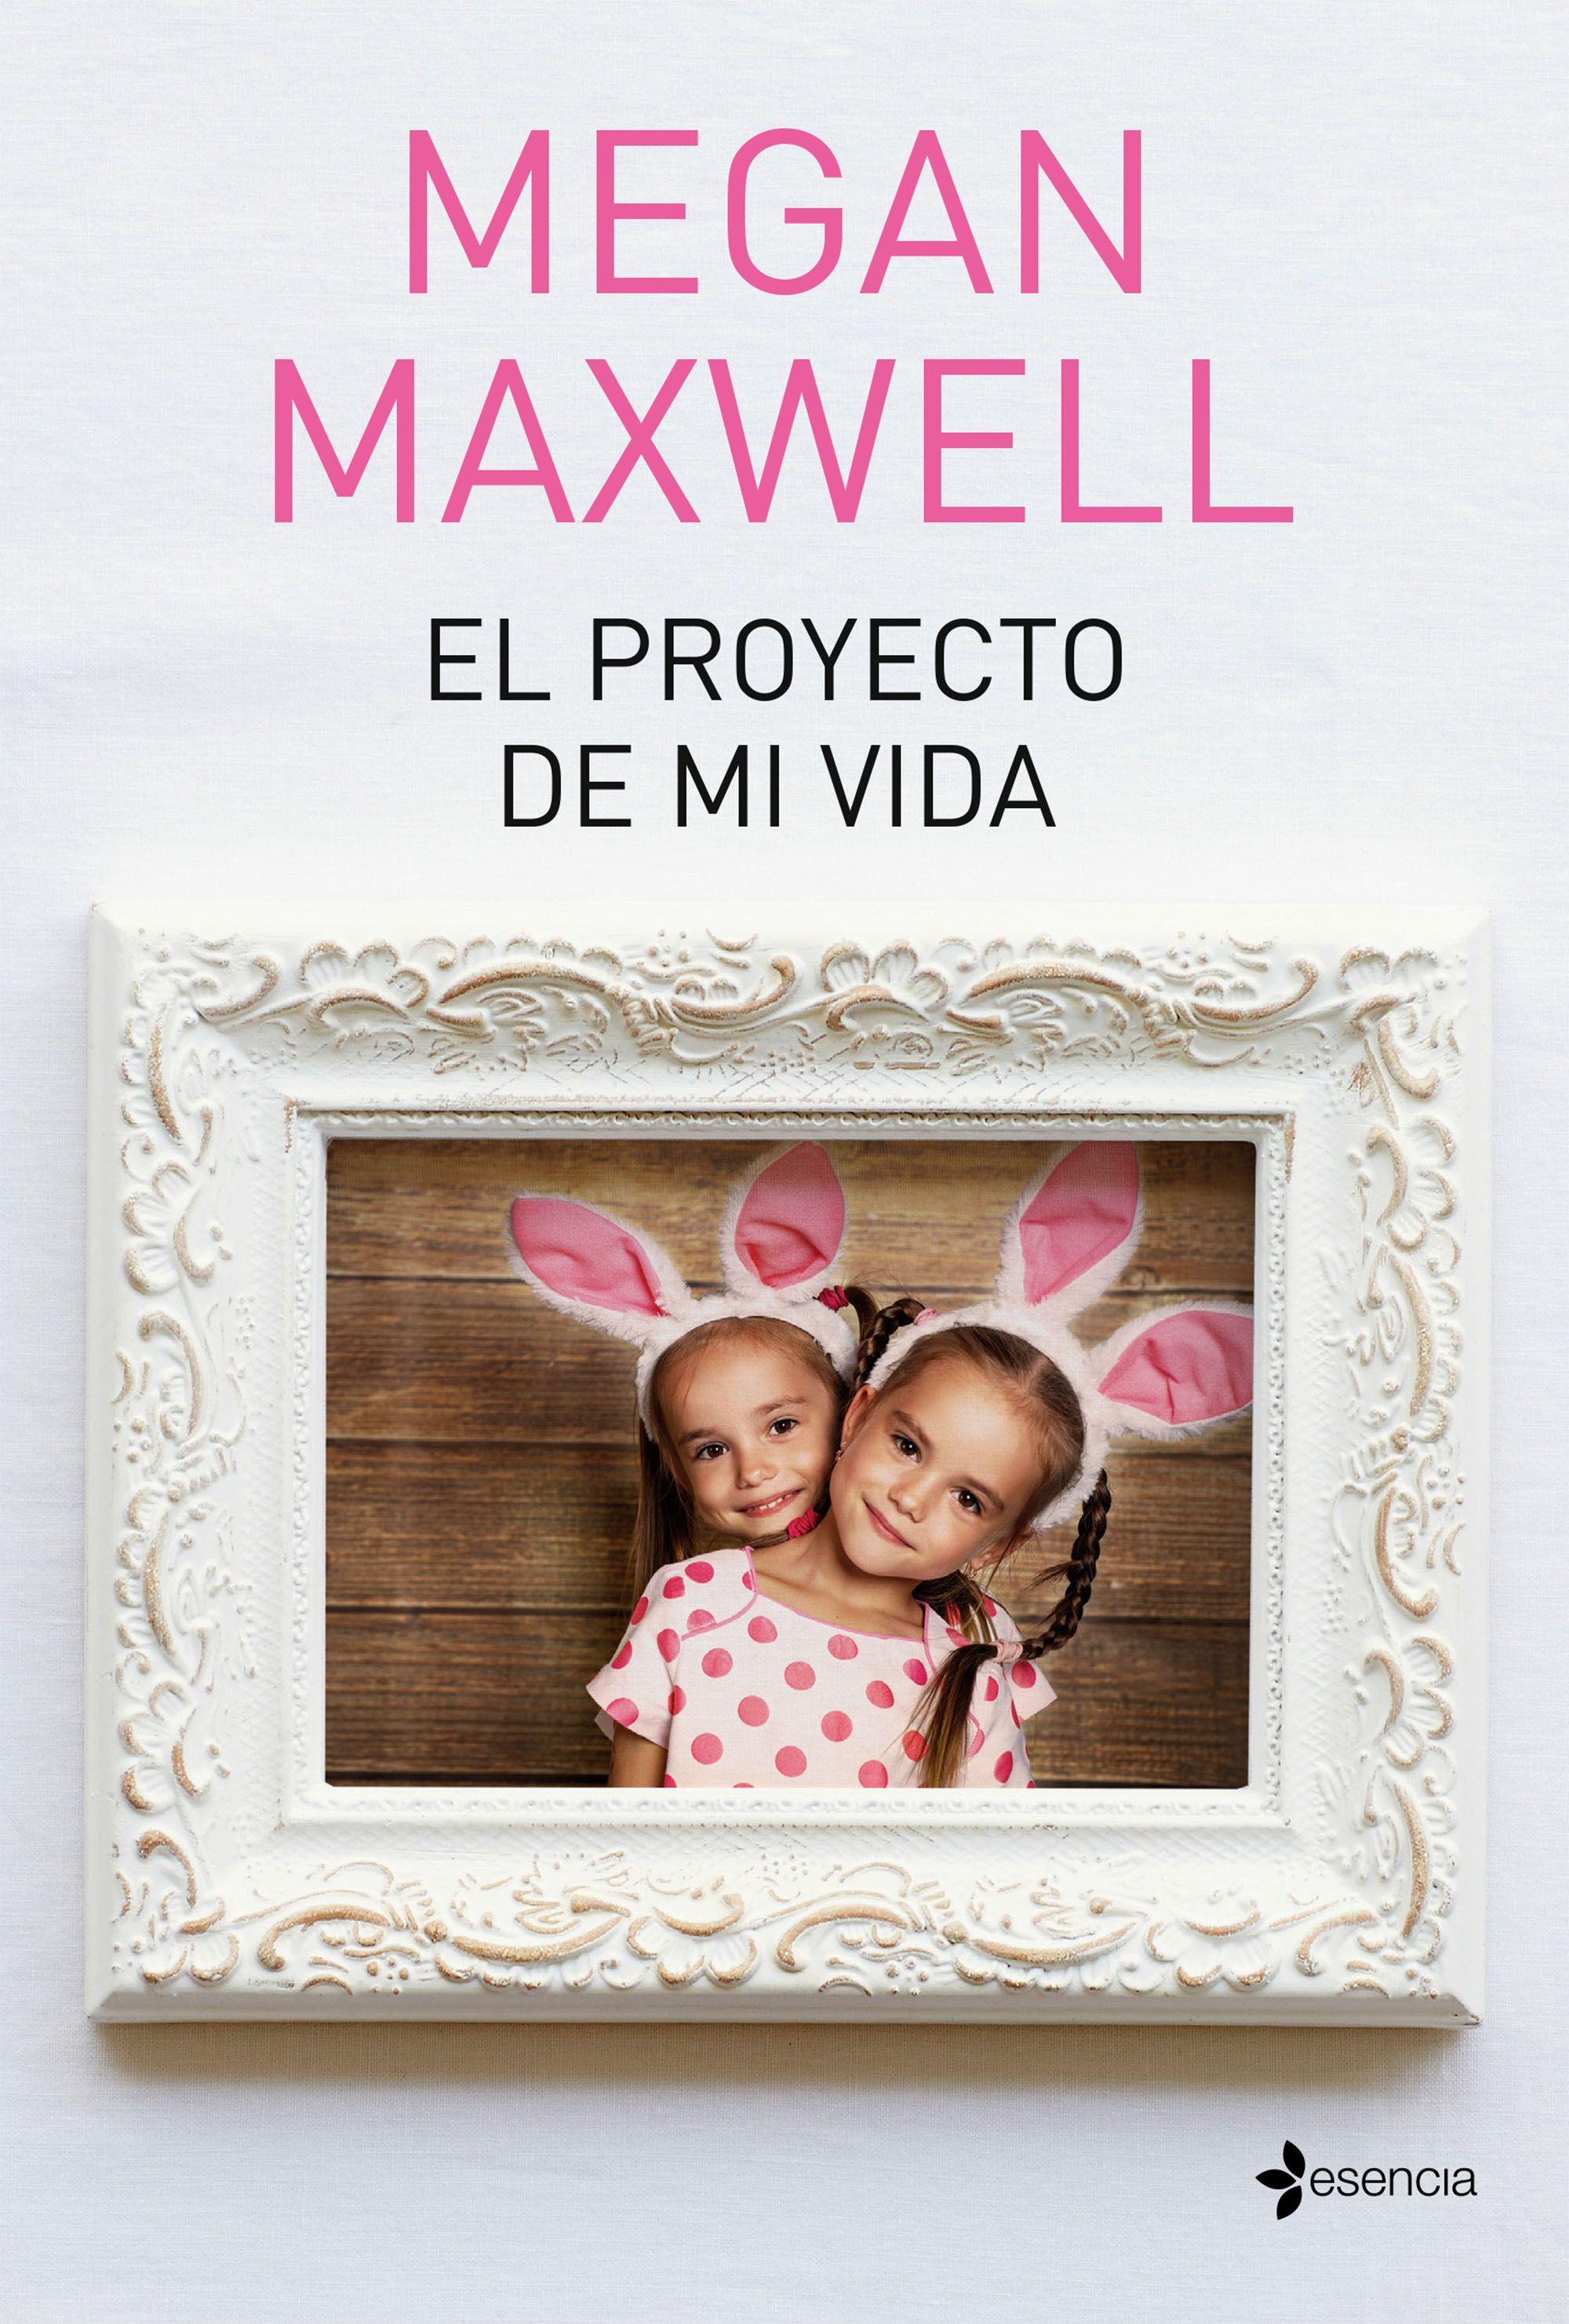 El proyecto de mi vida - Megan Maxwell Portada_el-proyecto-de-mi-vida_megan-maxwell_201803191609